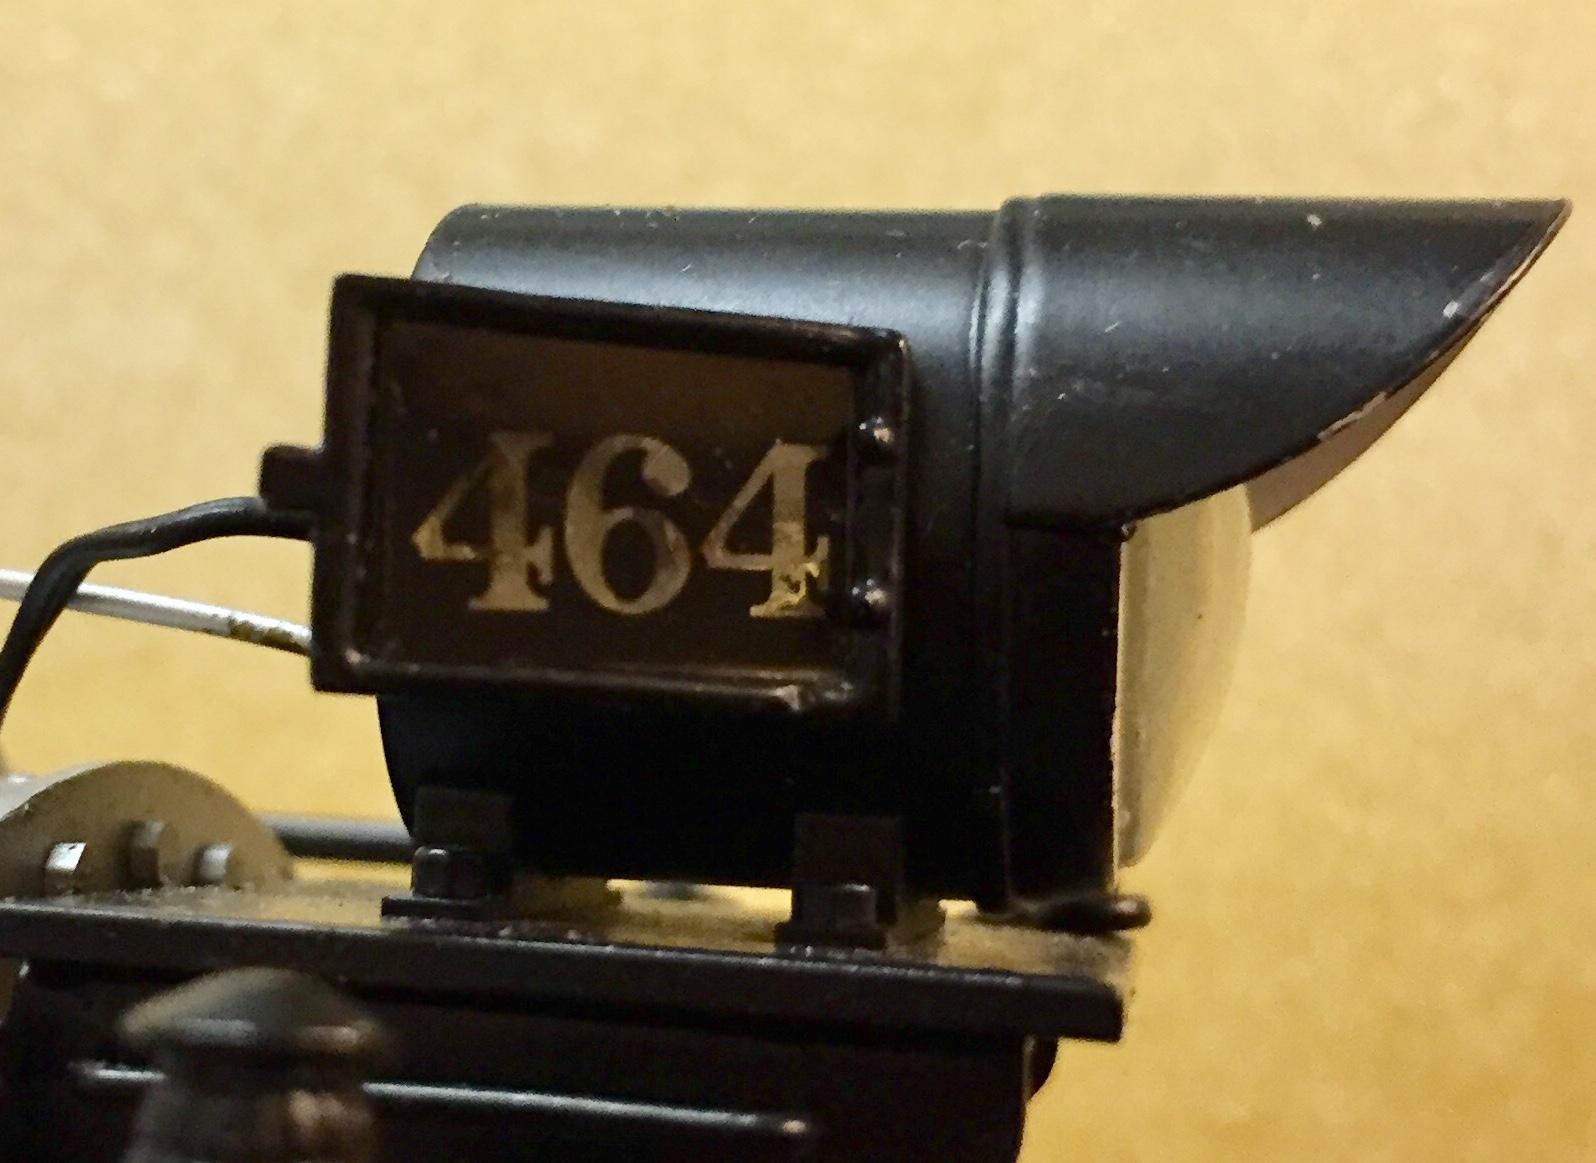 DDEBA177-40A0-48BD-B3B1-2921B2A43589.jpeg